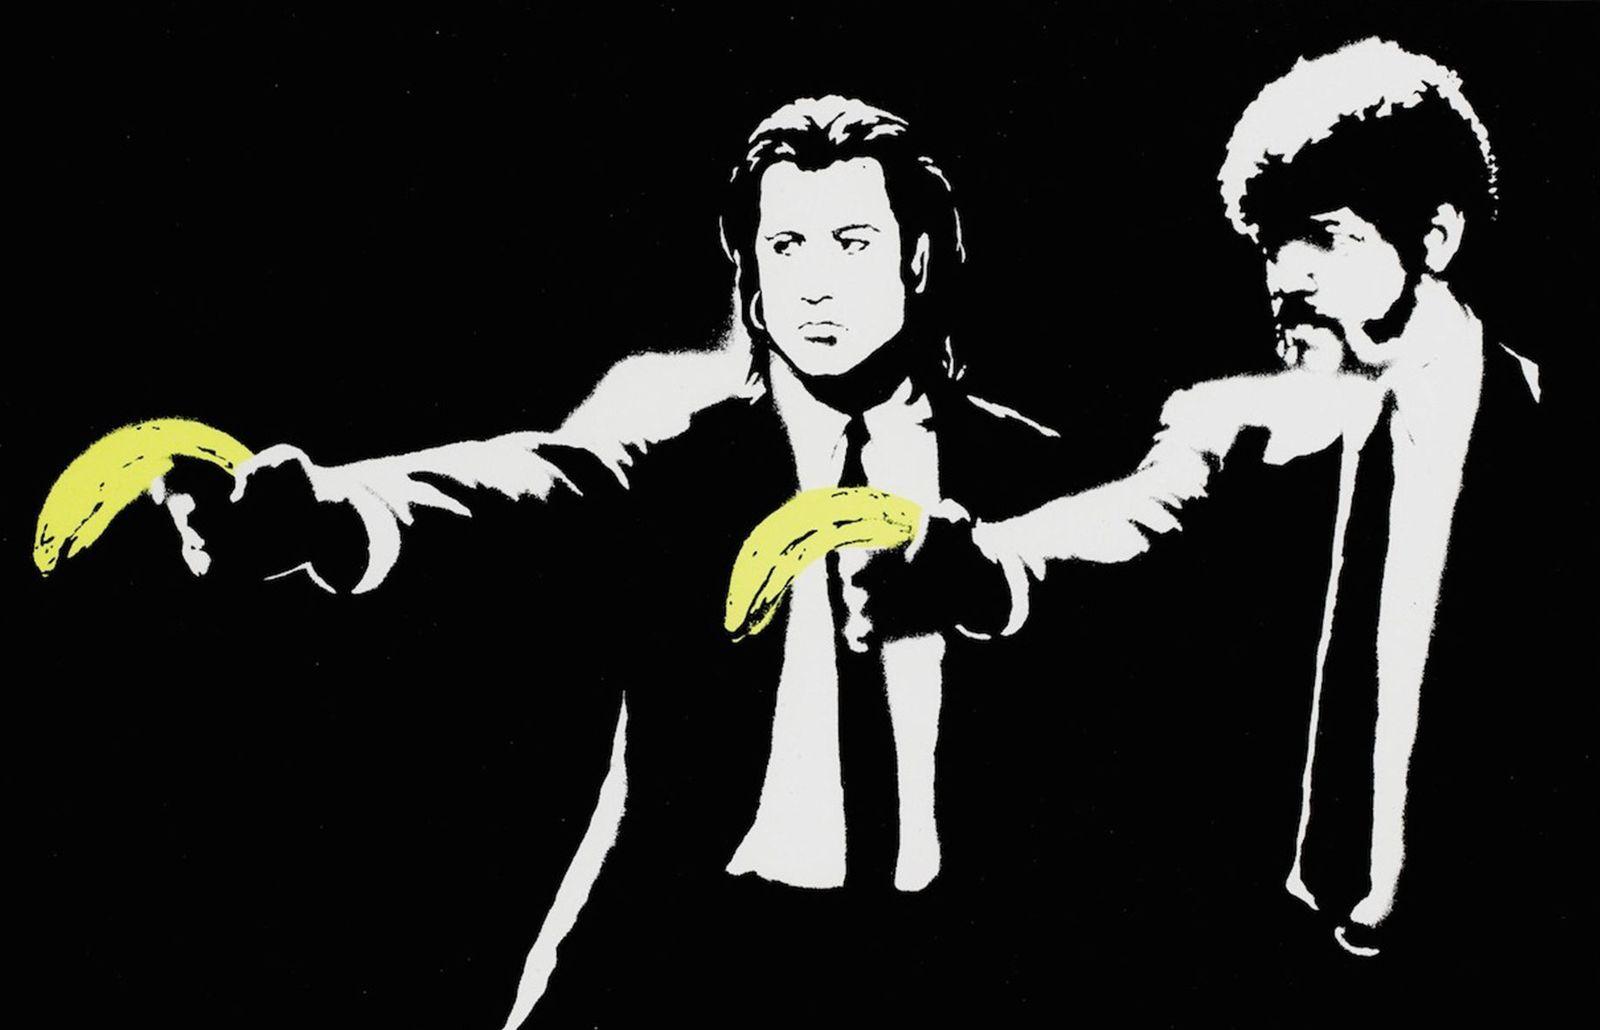 Foto: 'Pulp Fiction' según Banksy